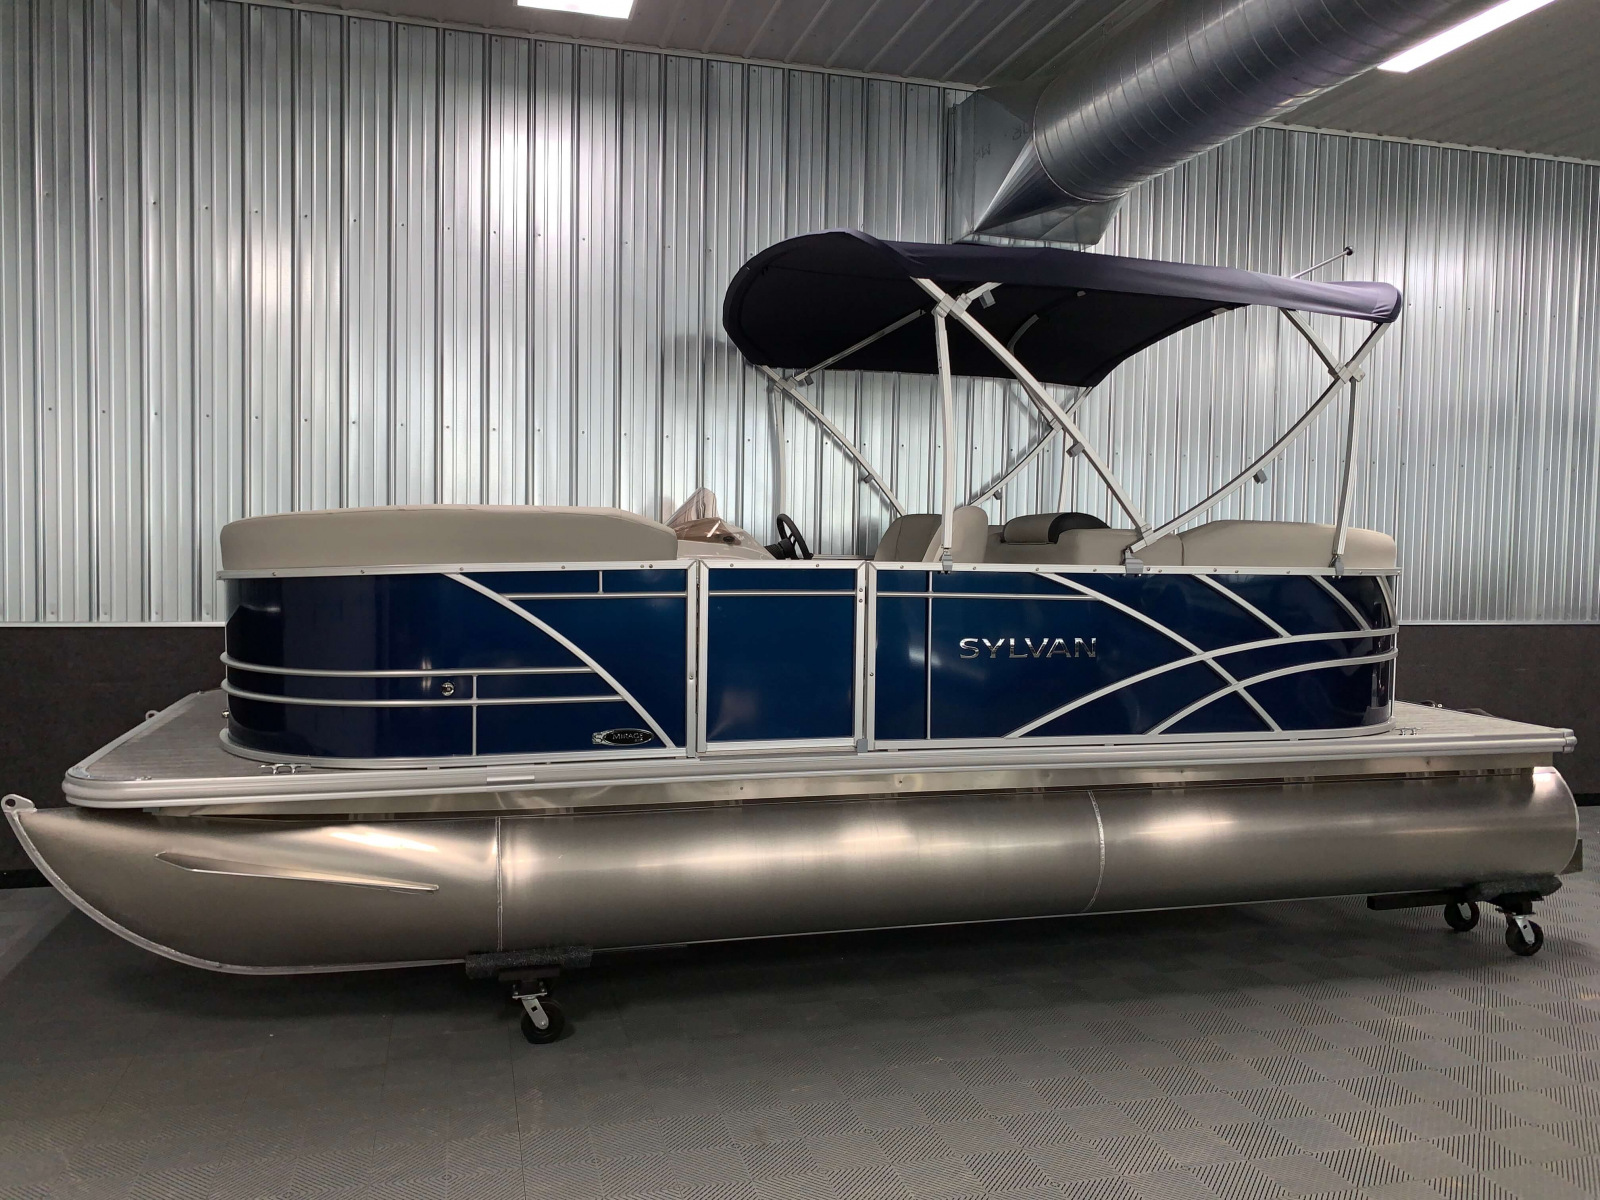 Exterior Panel Design of the 2021 Sylvan 820 LZ Pontoon Boat